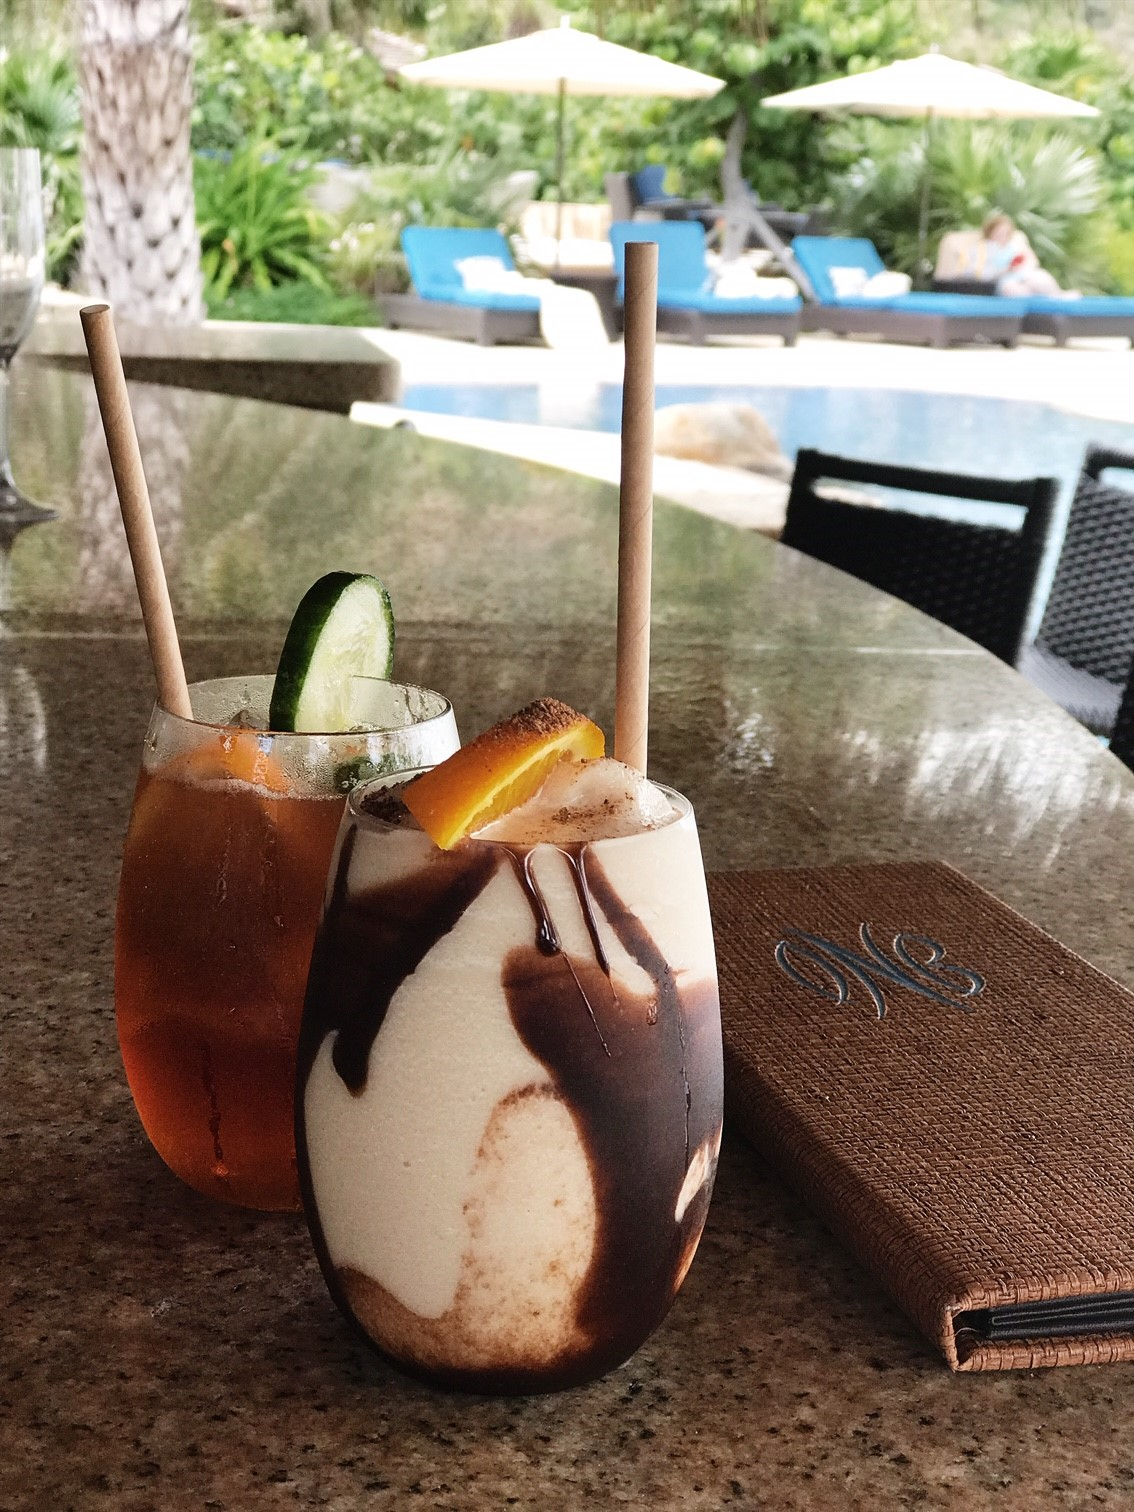 Top Virgin Islands Cocktails - Bushwhacker at Oil Nut Bay, Virgin Gorda